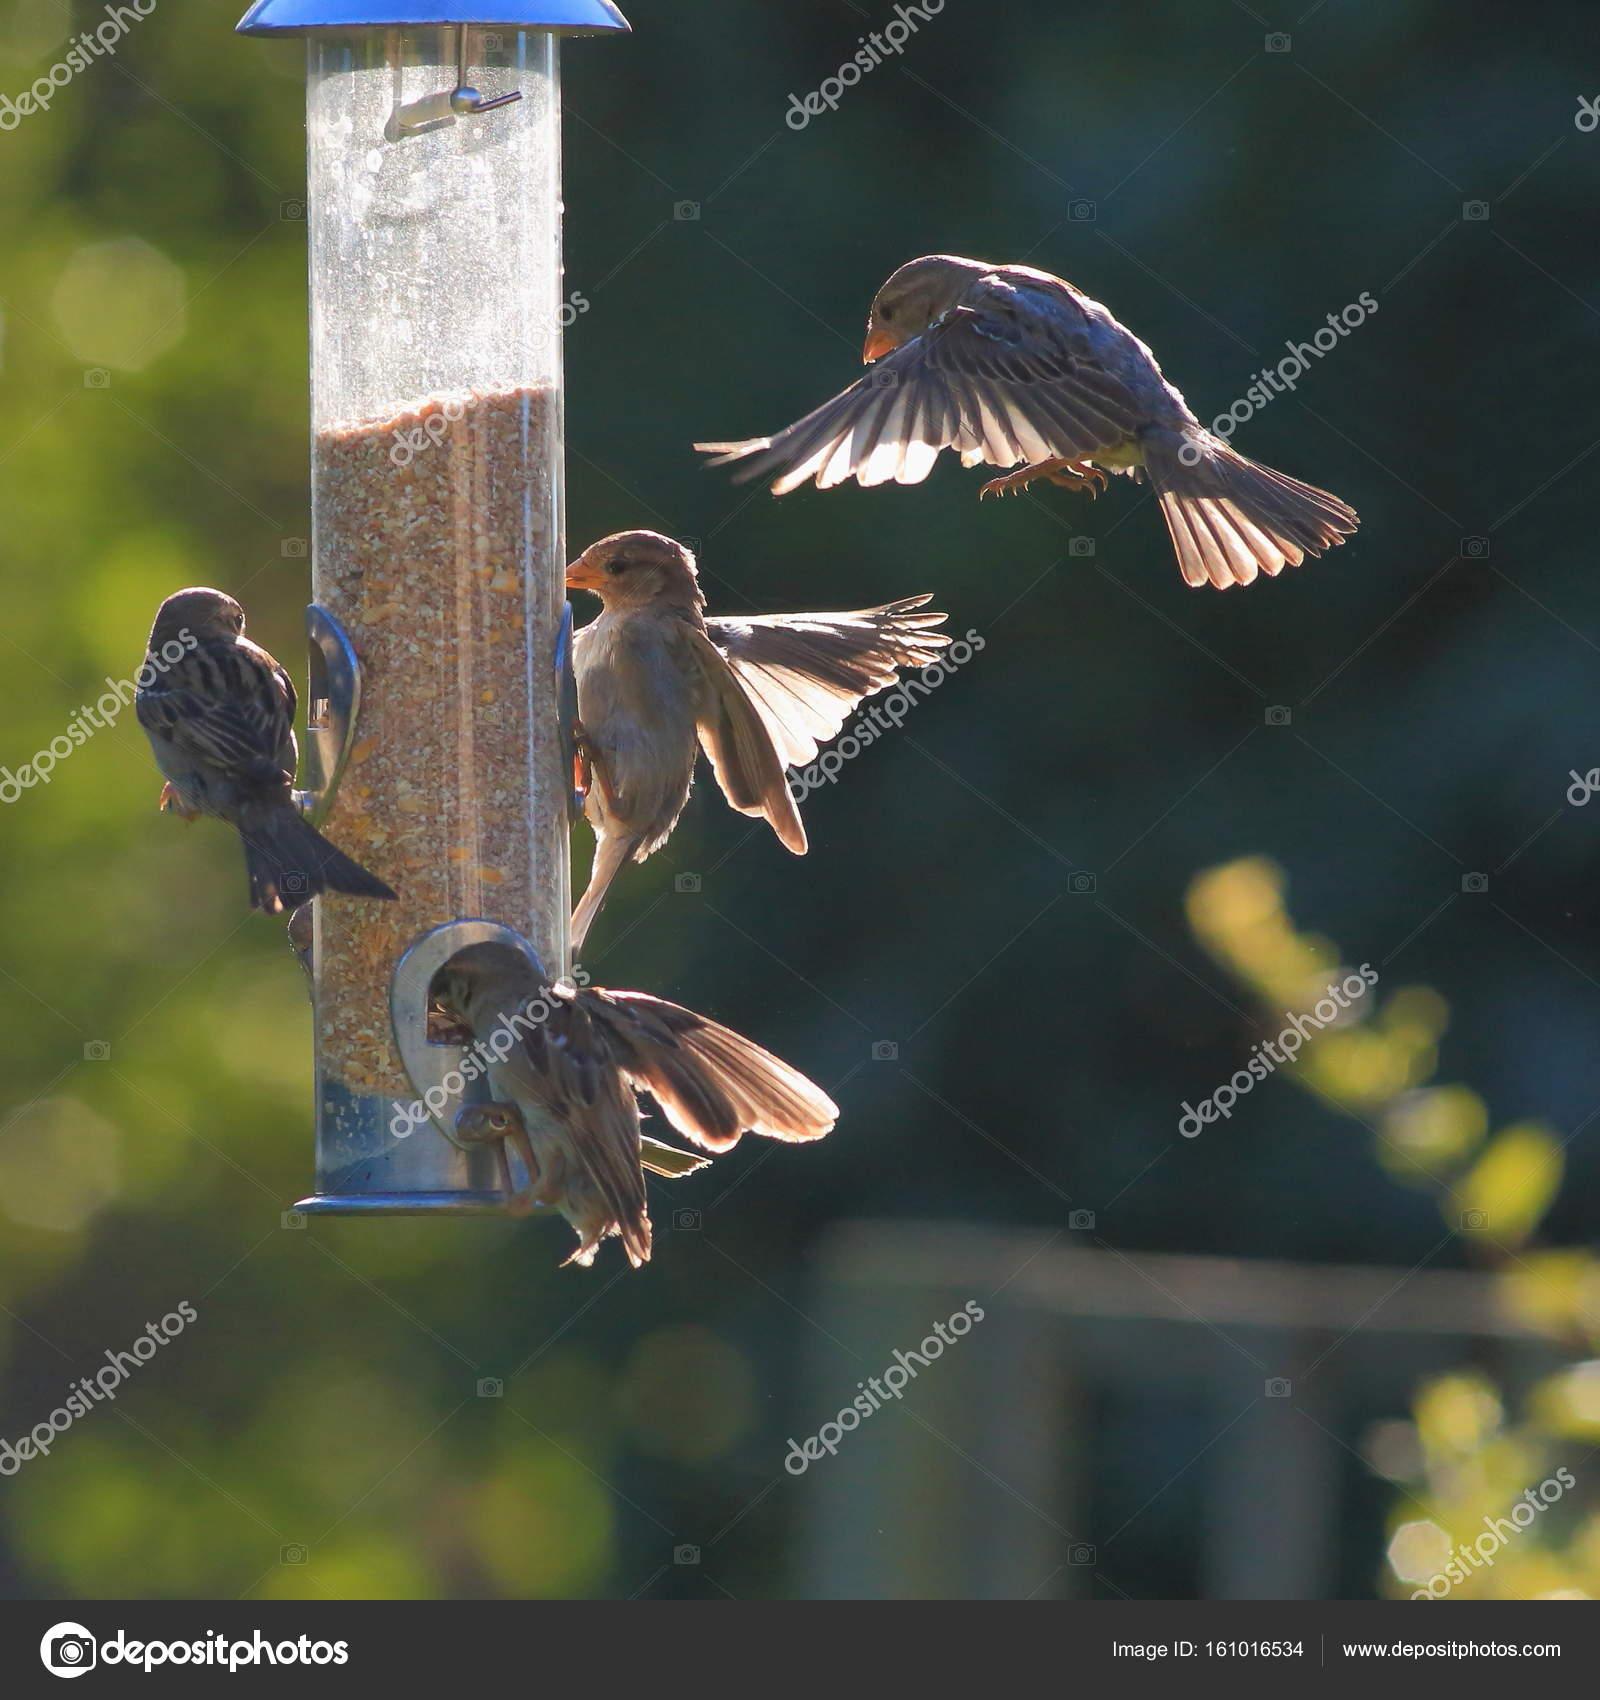 feederbirds wild unique for bird station image feeder birdsfinch full in compact finchesfinchfeederfeeding garden feeding